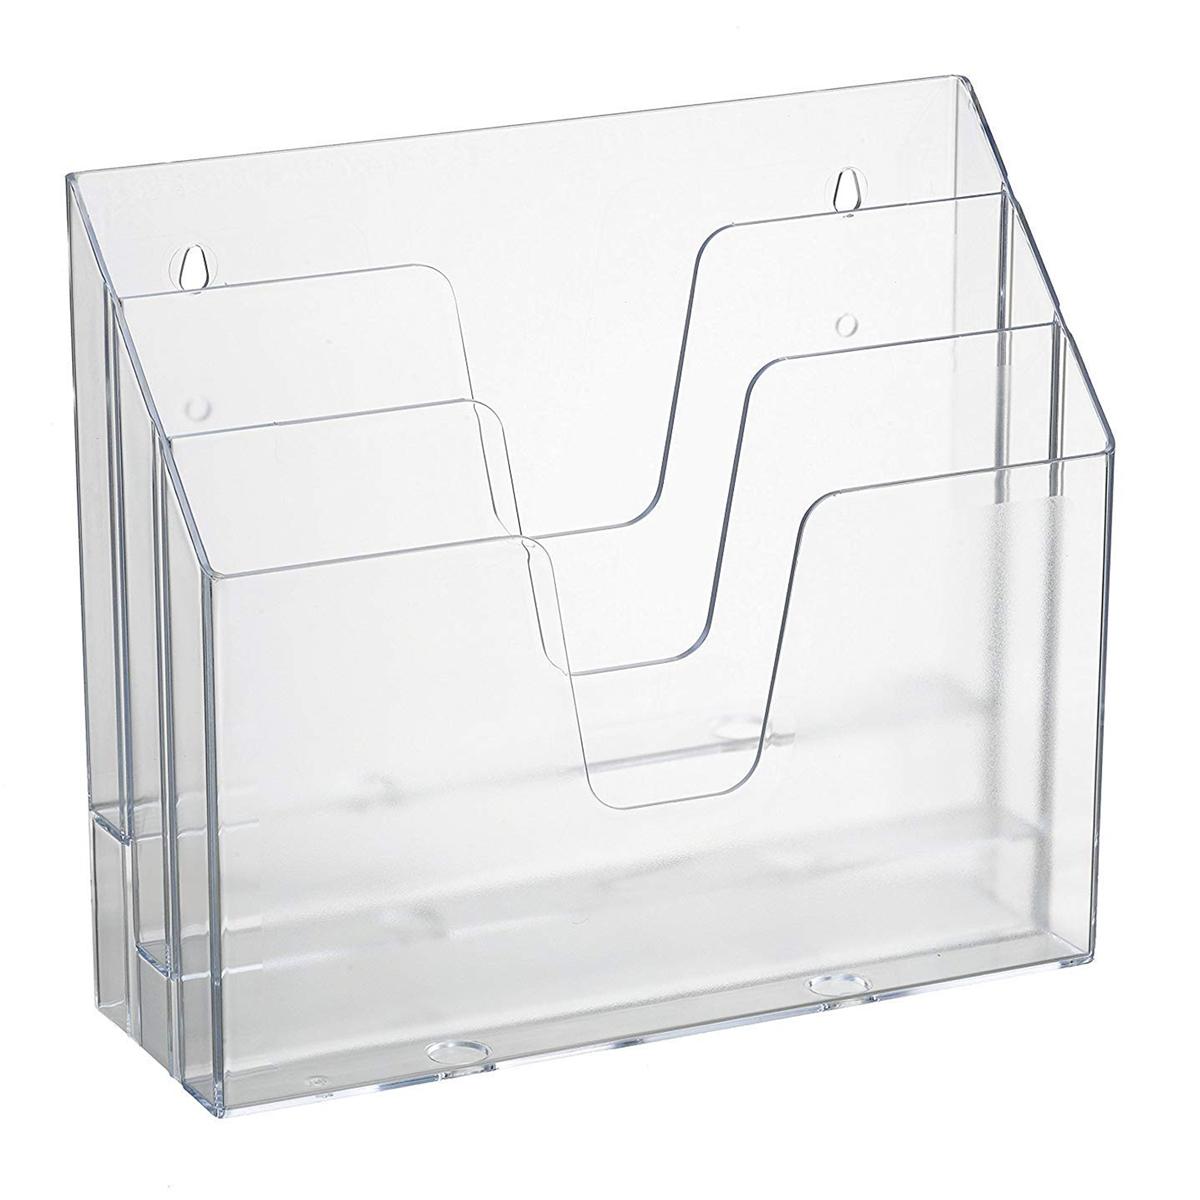 Acrimet Horizontal Triple File Folder Organizer (Clear Crystal Color)